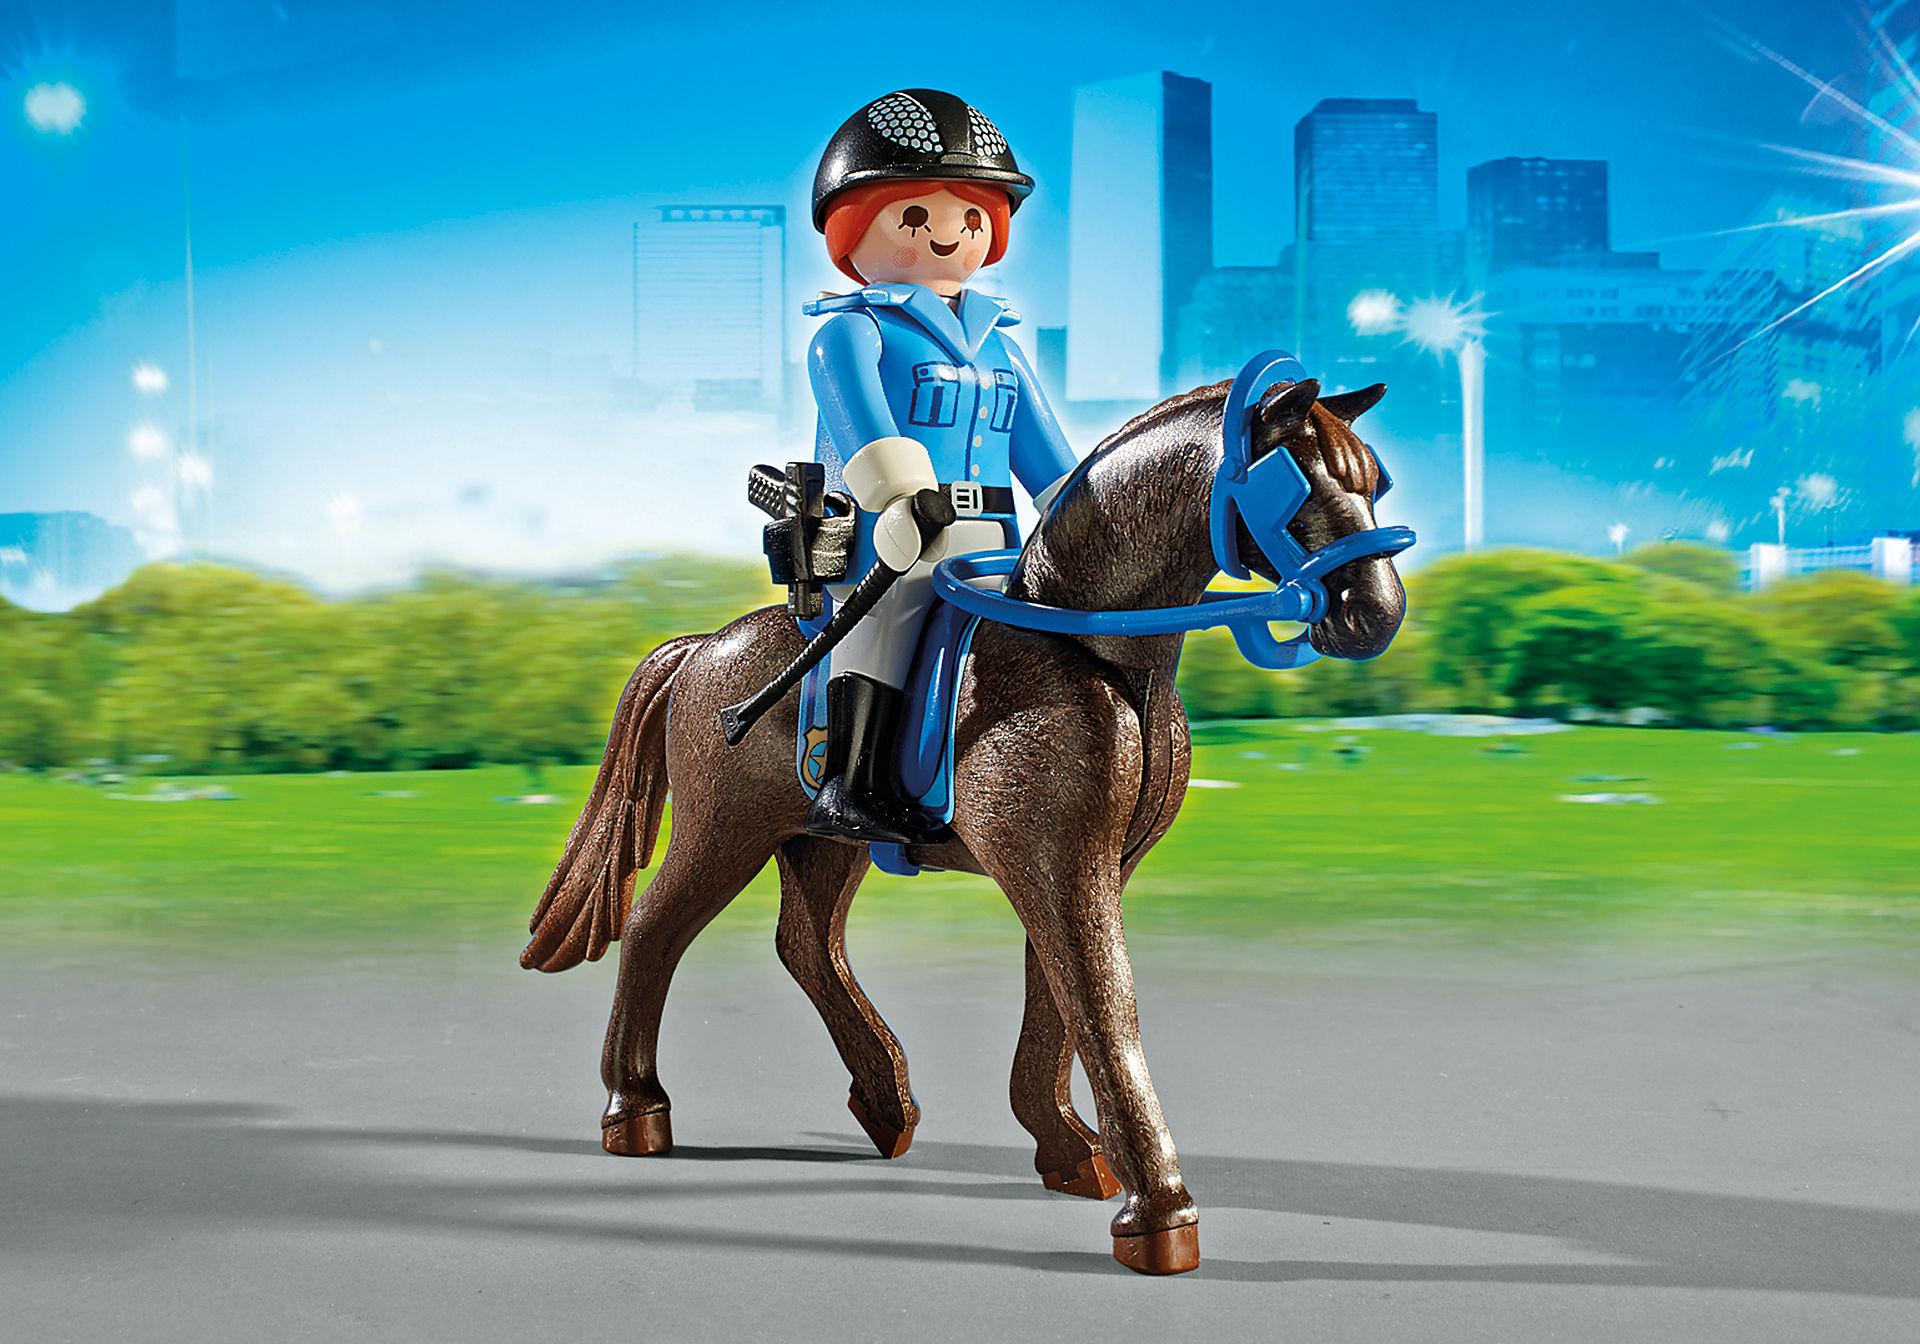 http://media.playmobil.com/i/playmobil/6922_product_extra3/Poliziotta a cavallo con rimorchio